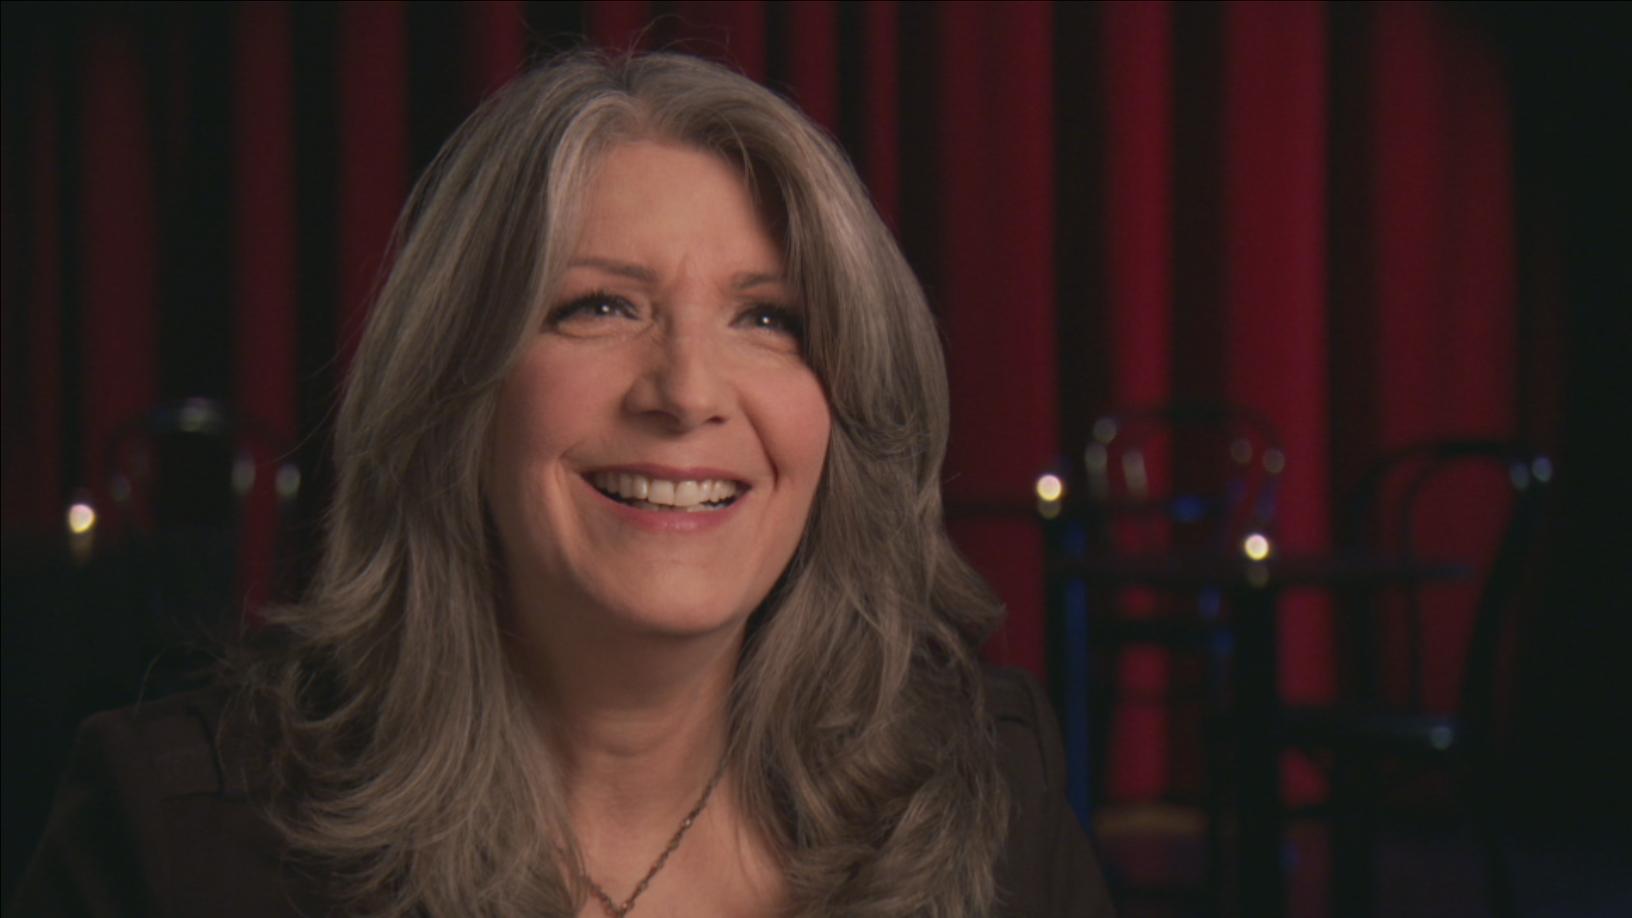 Closeup image of Kathy Mattea